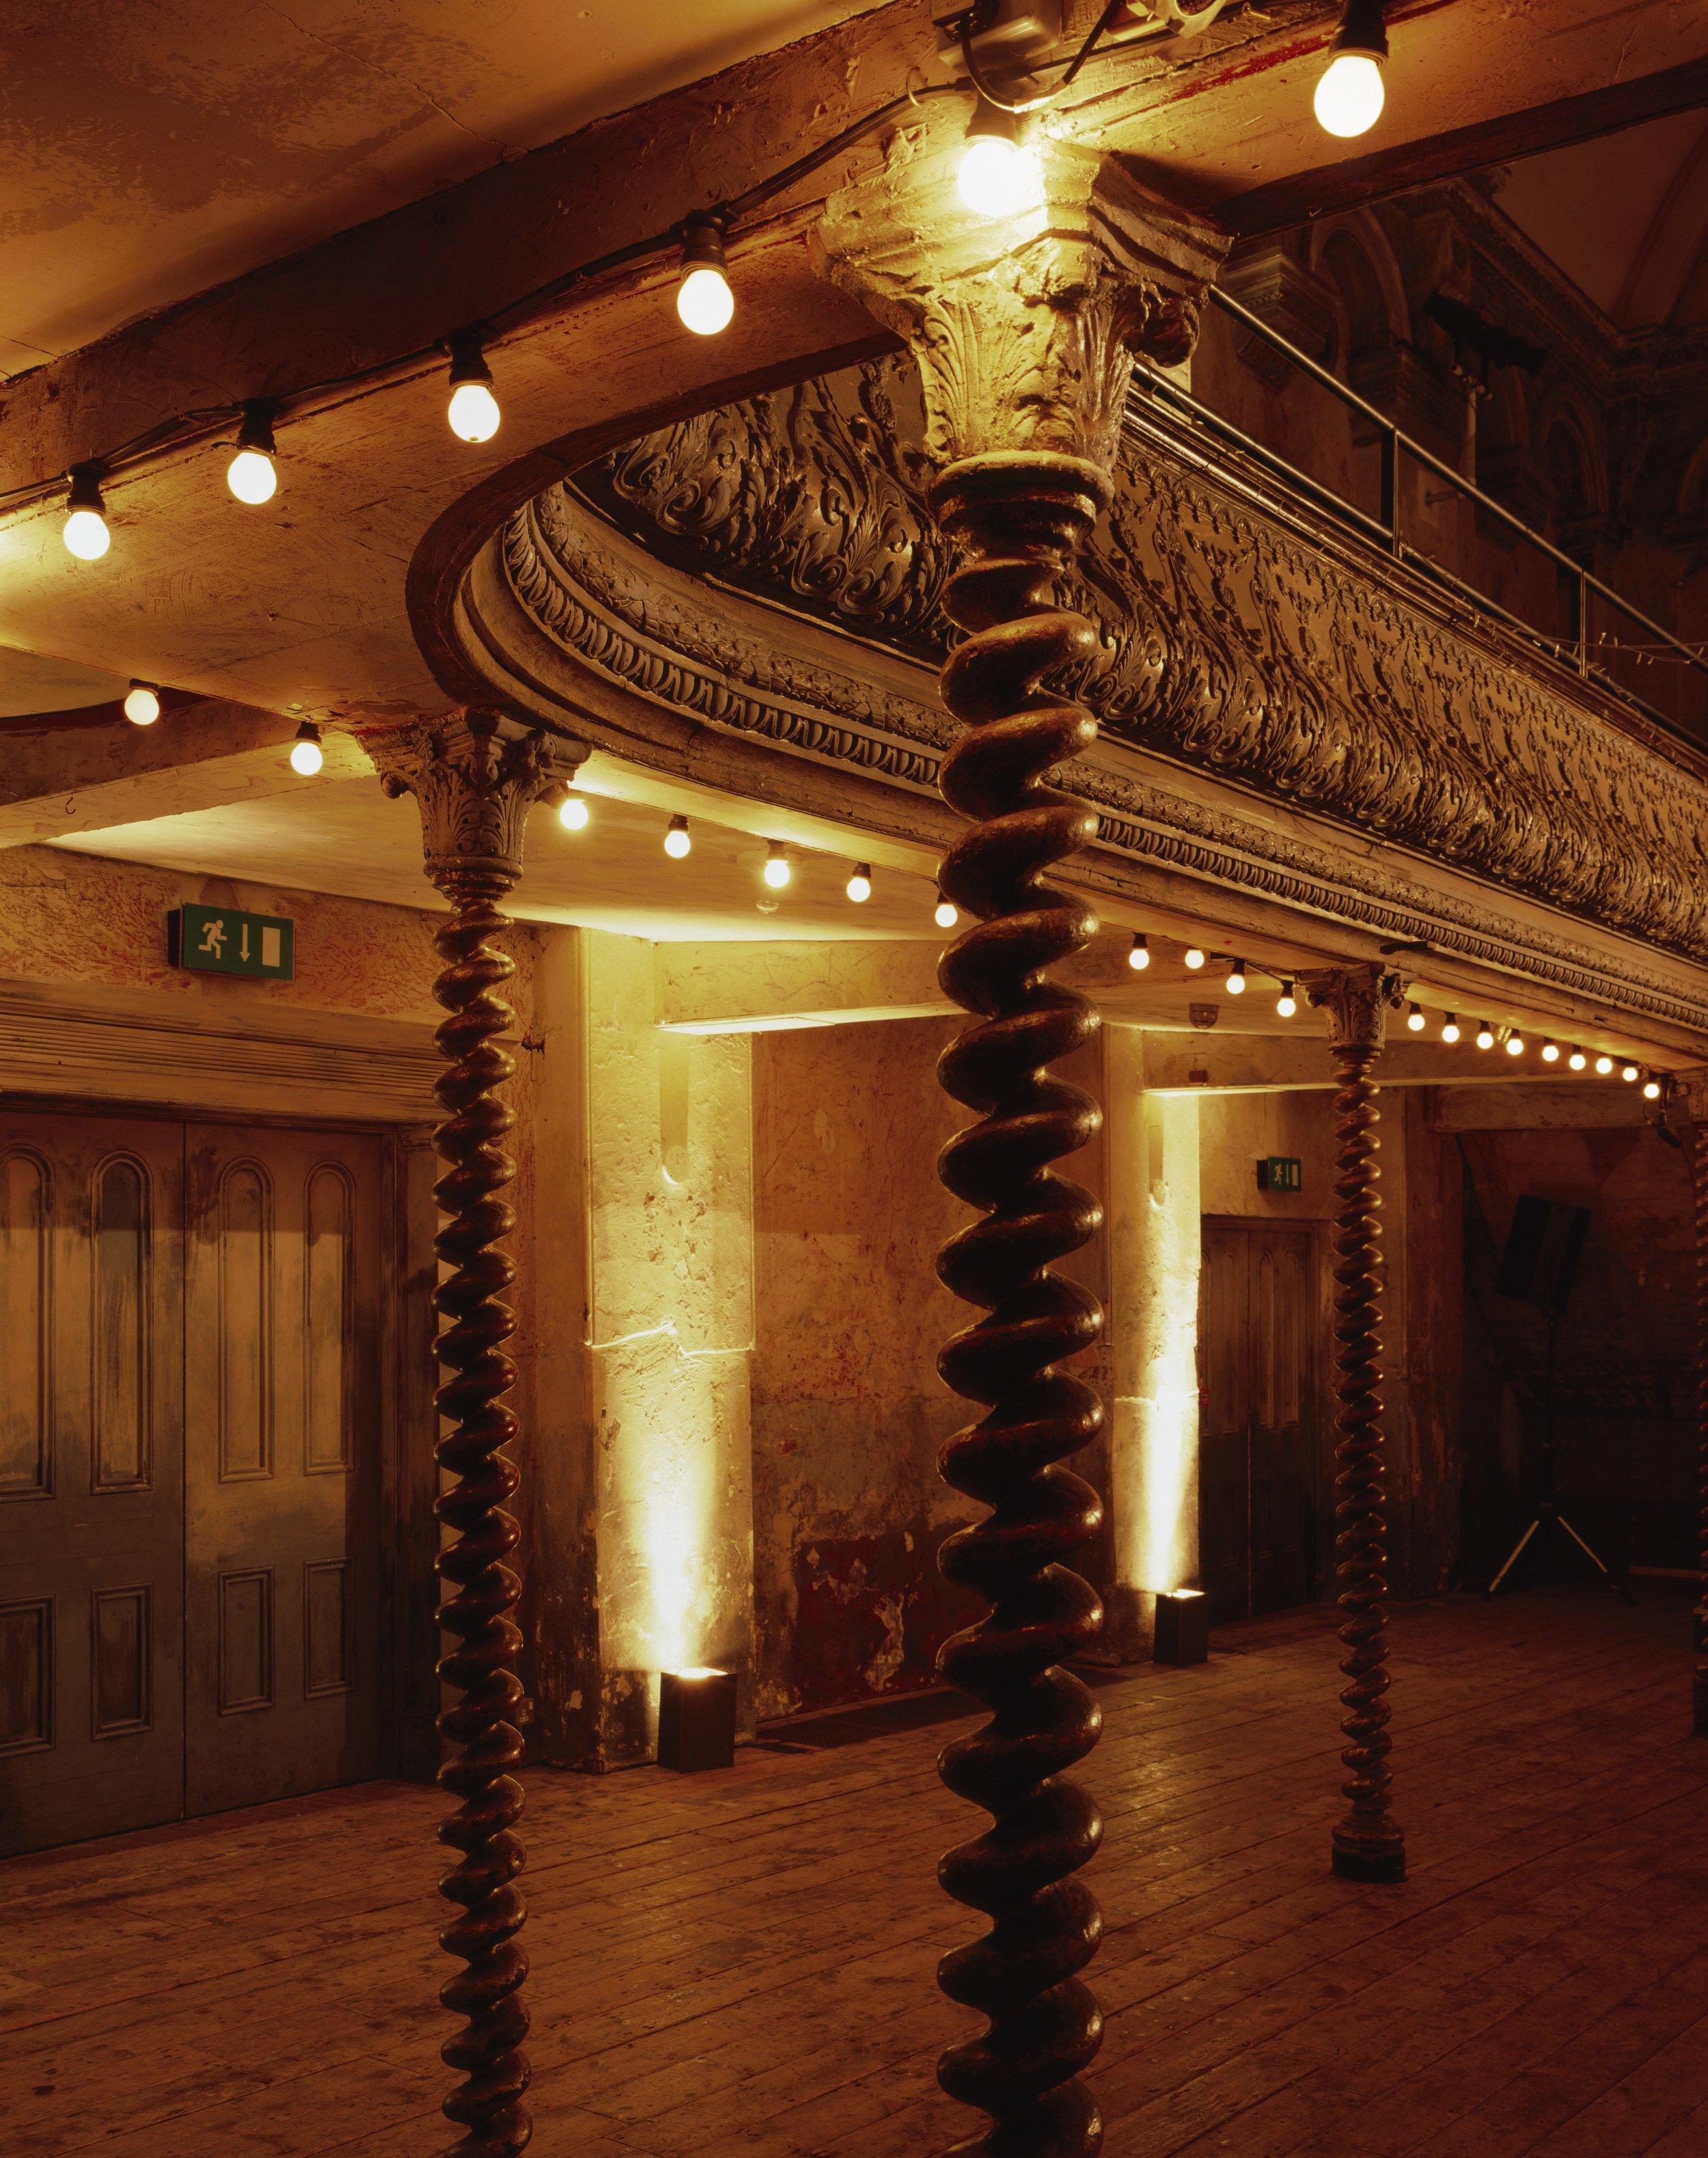 Wiltons-Music-Hall.-Credit-Helene-Binet-1.jpg